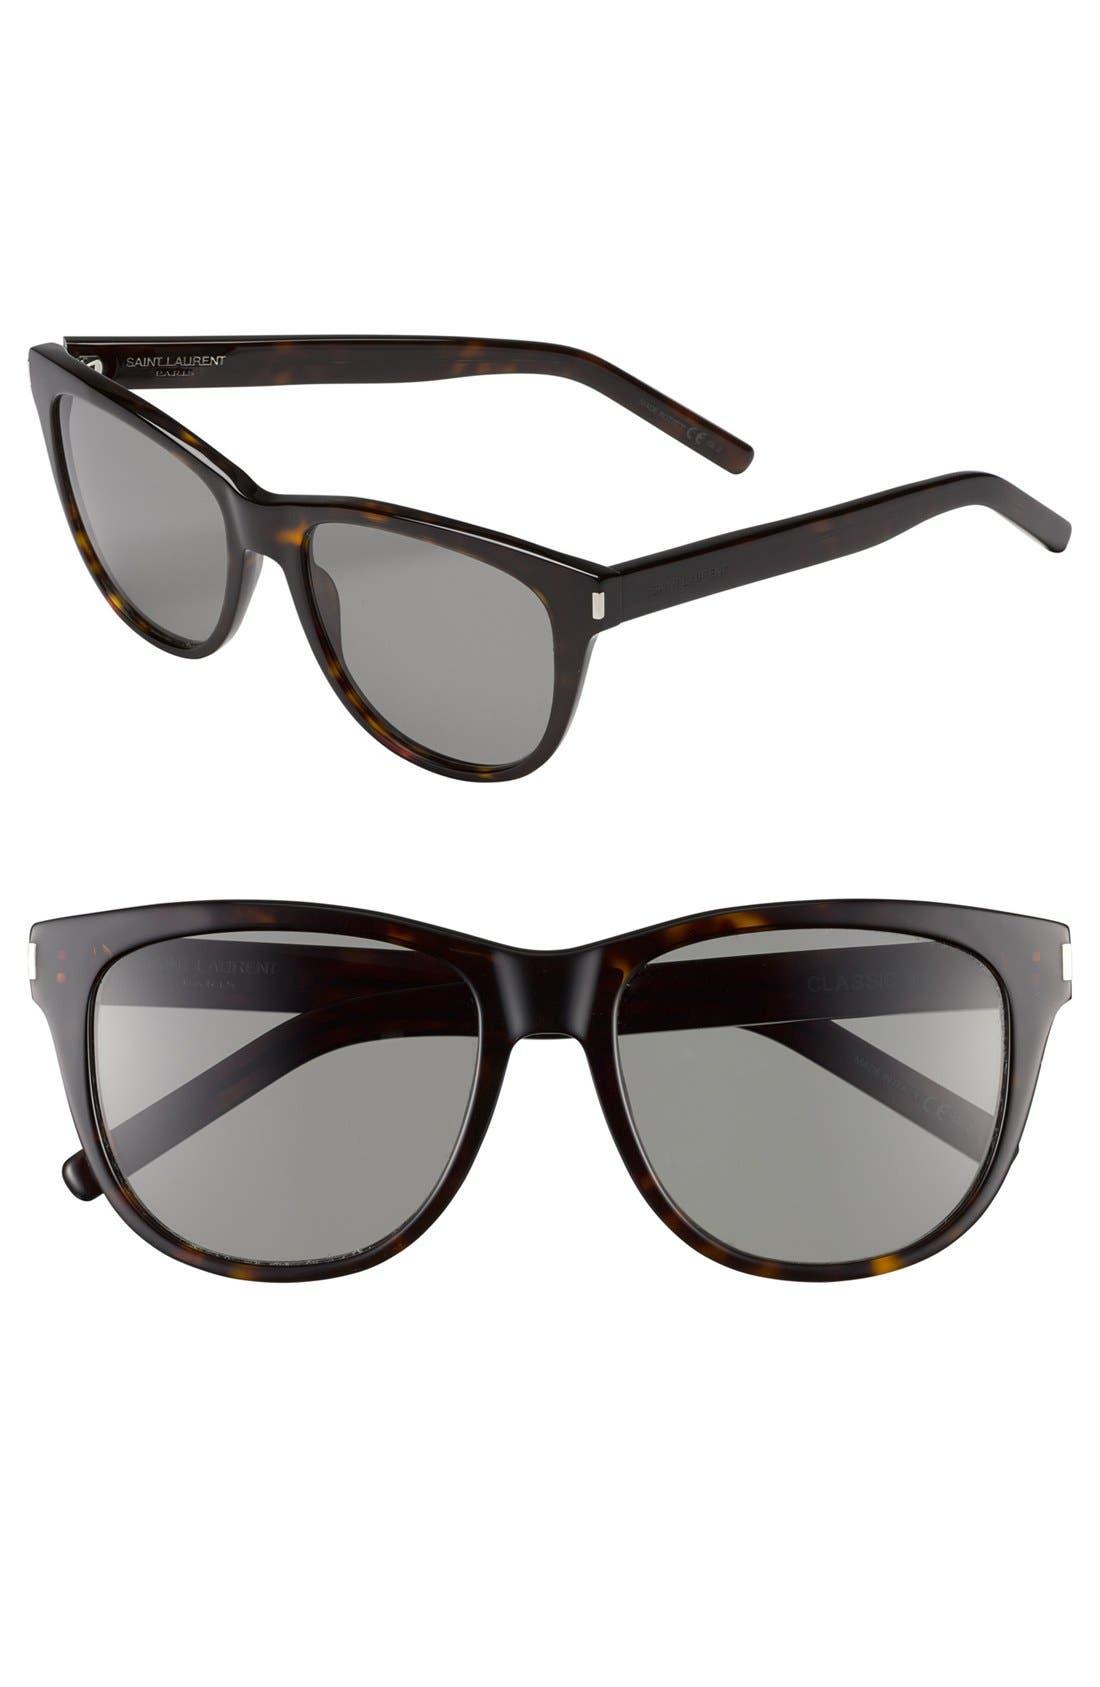 Alternate Image 1 Selected - Saint Laurent 55mm Retro Sunglasses